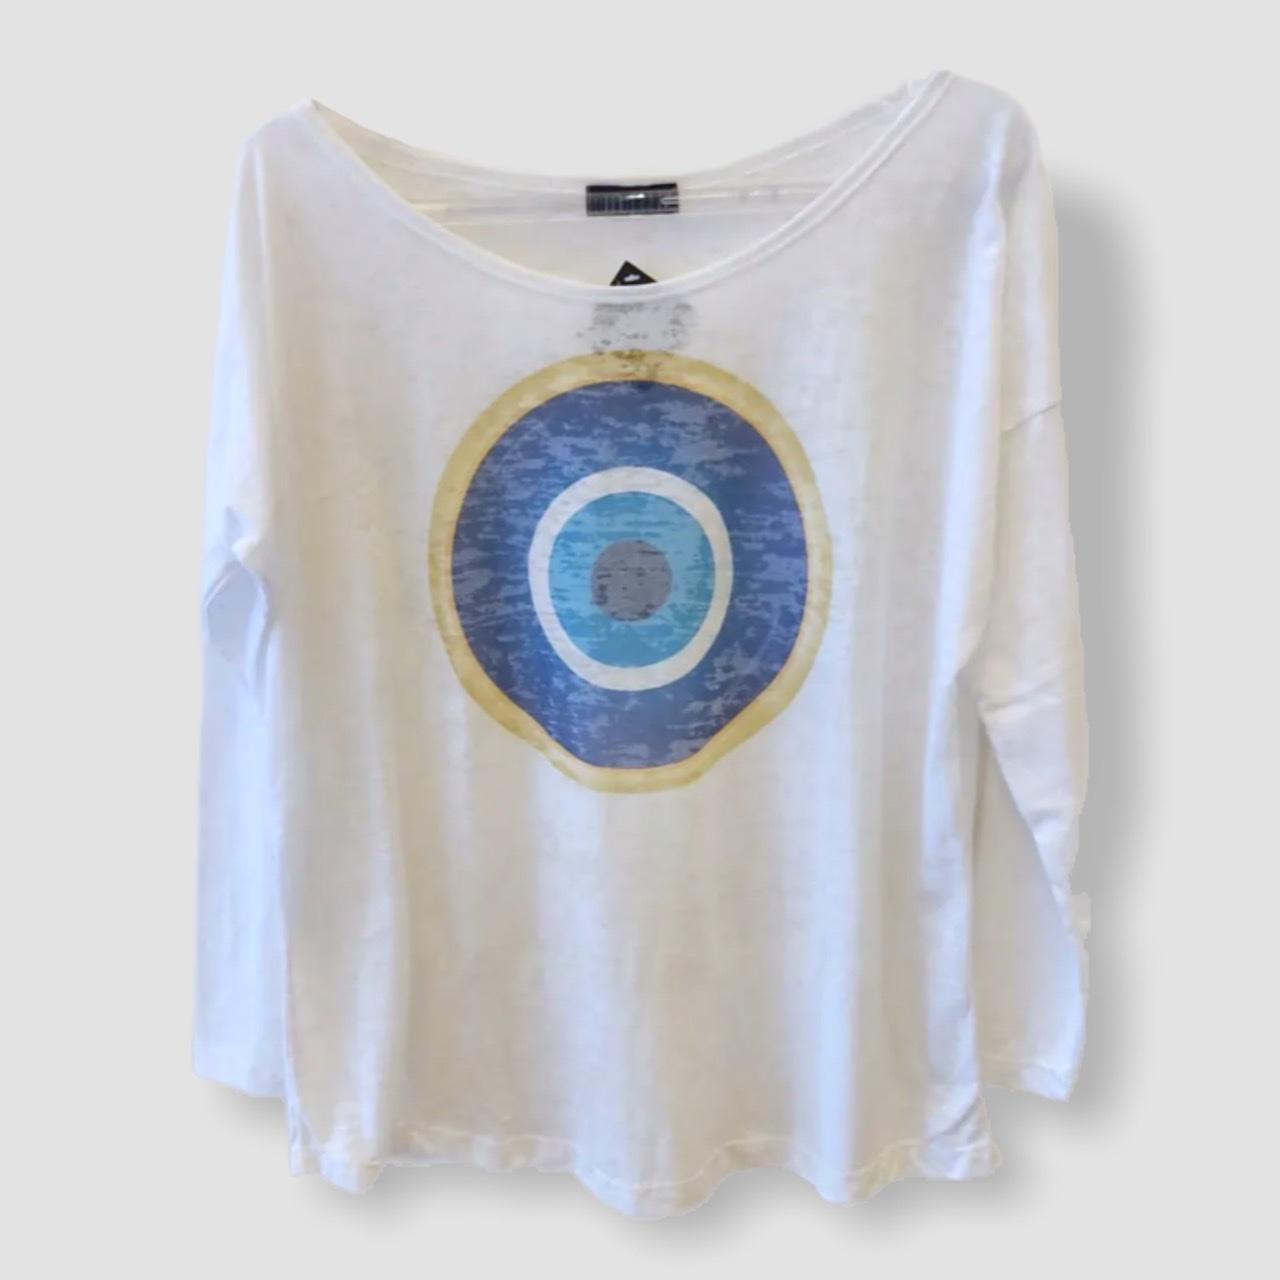 Camiseta devorê manga longa olho grego  - Vivian Bógus